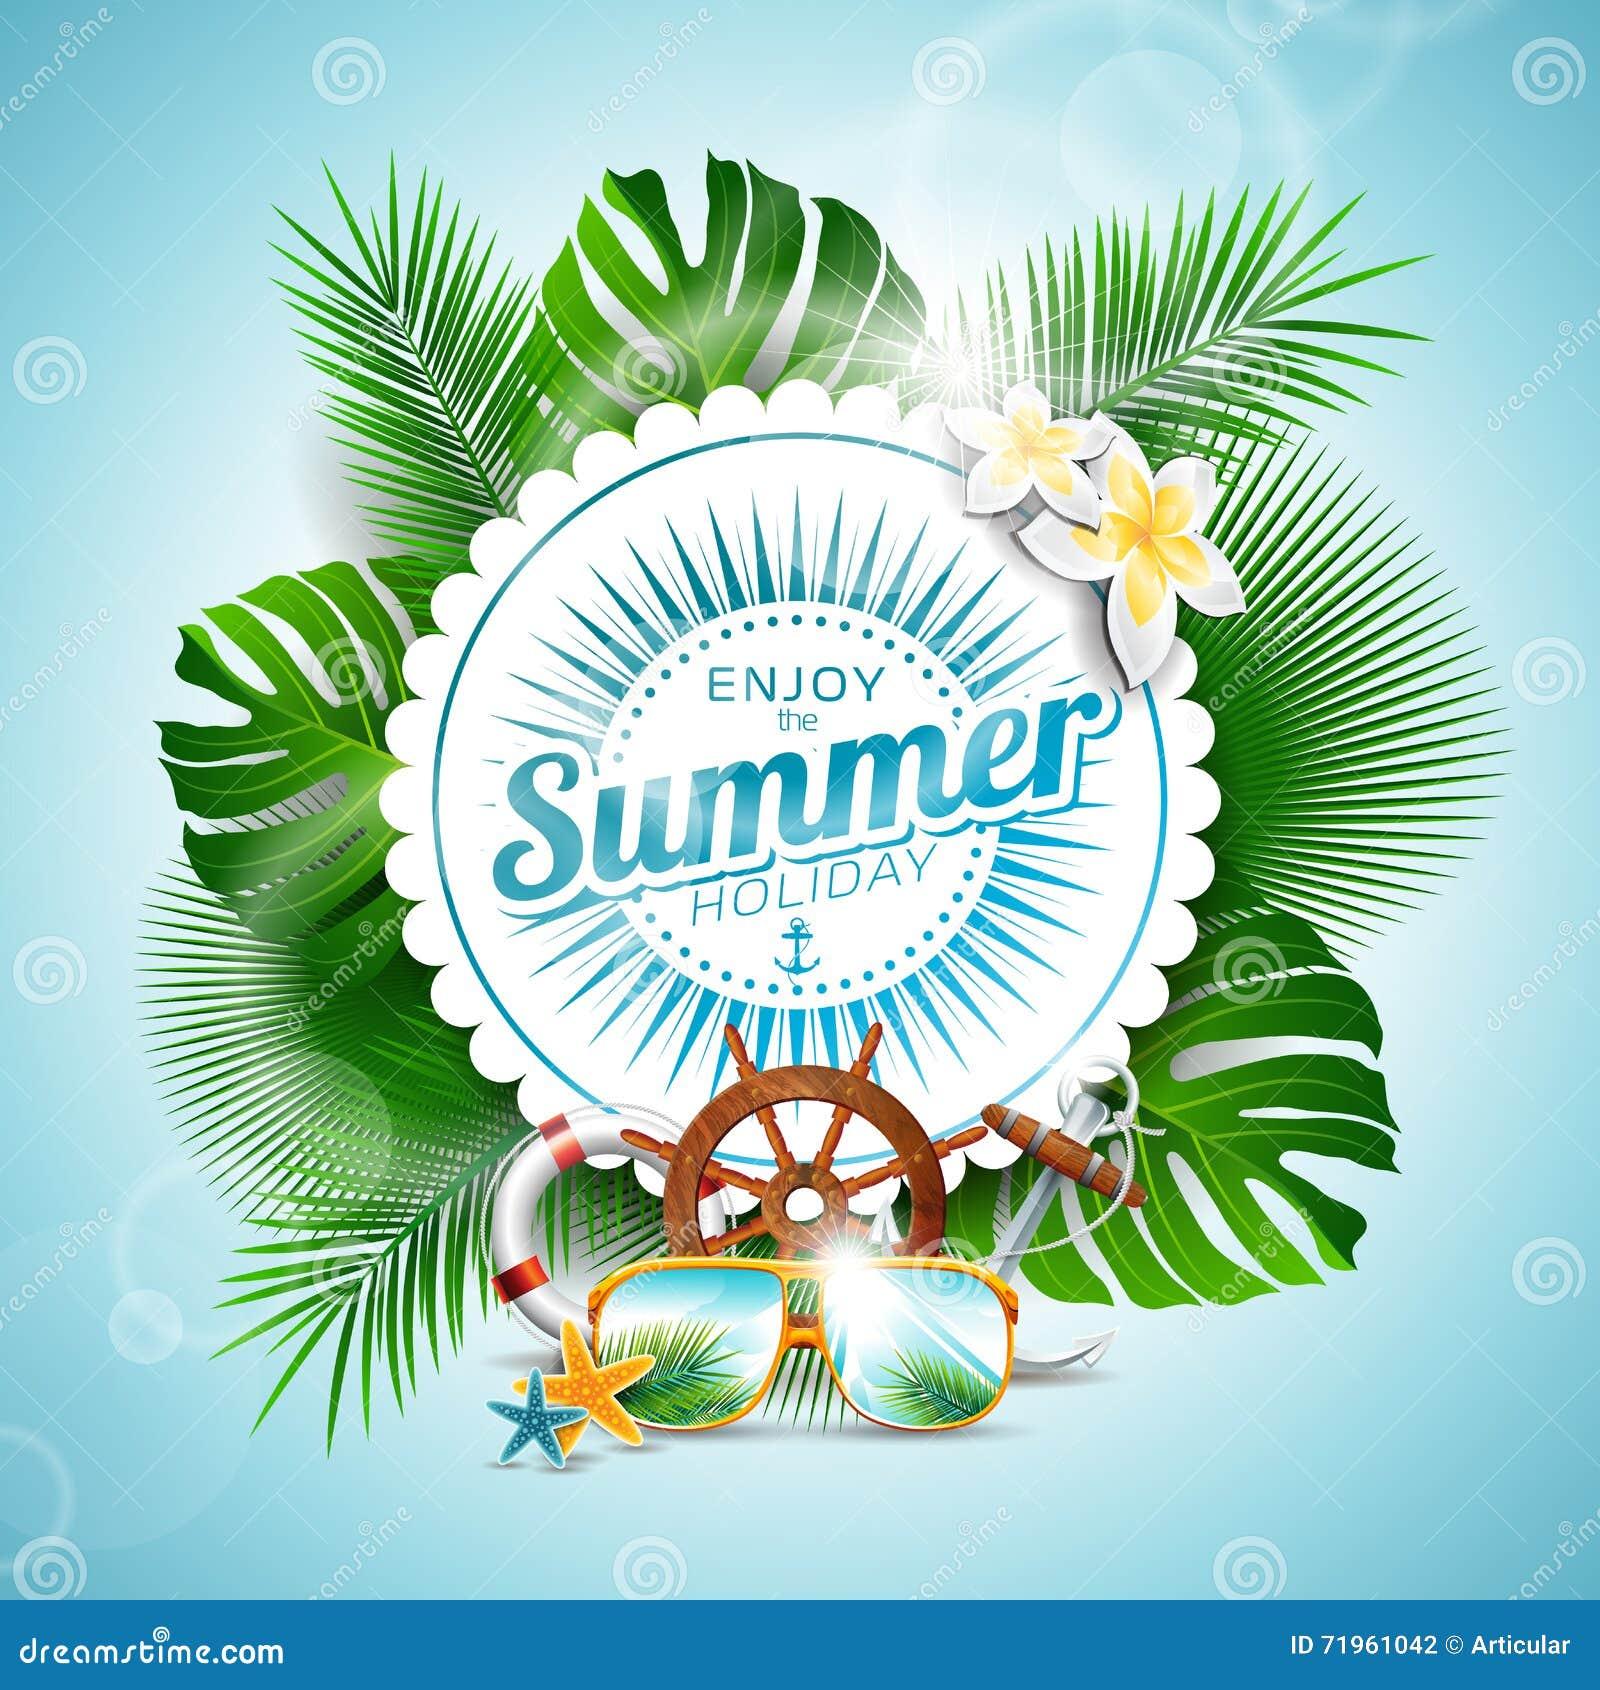 Couple Enjoying Their Summer Holidays Stock Photo: Vector Enjoy The Summer Holiday Typographic Illustration